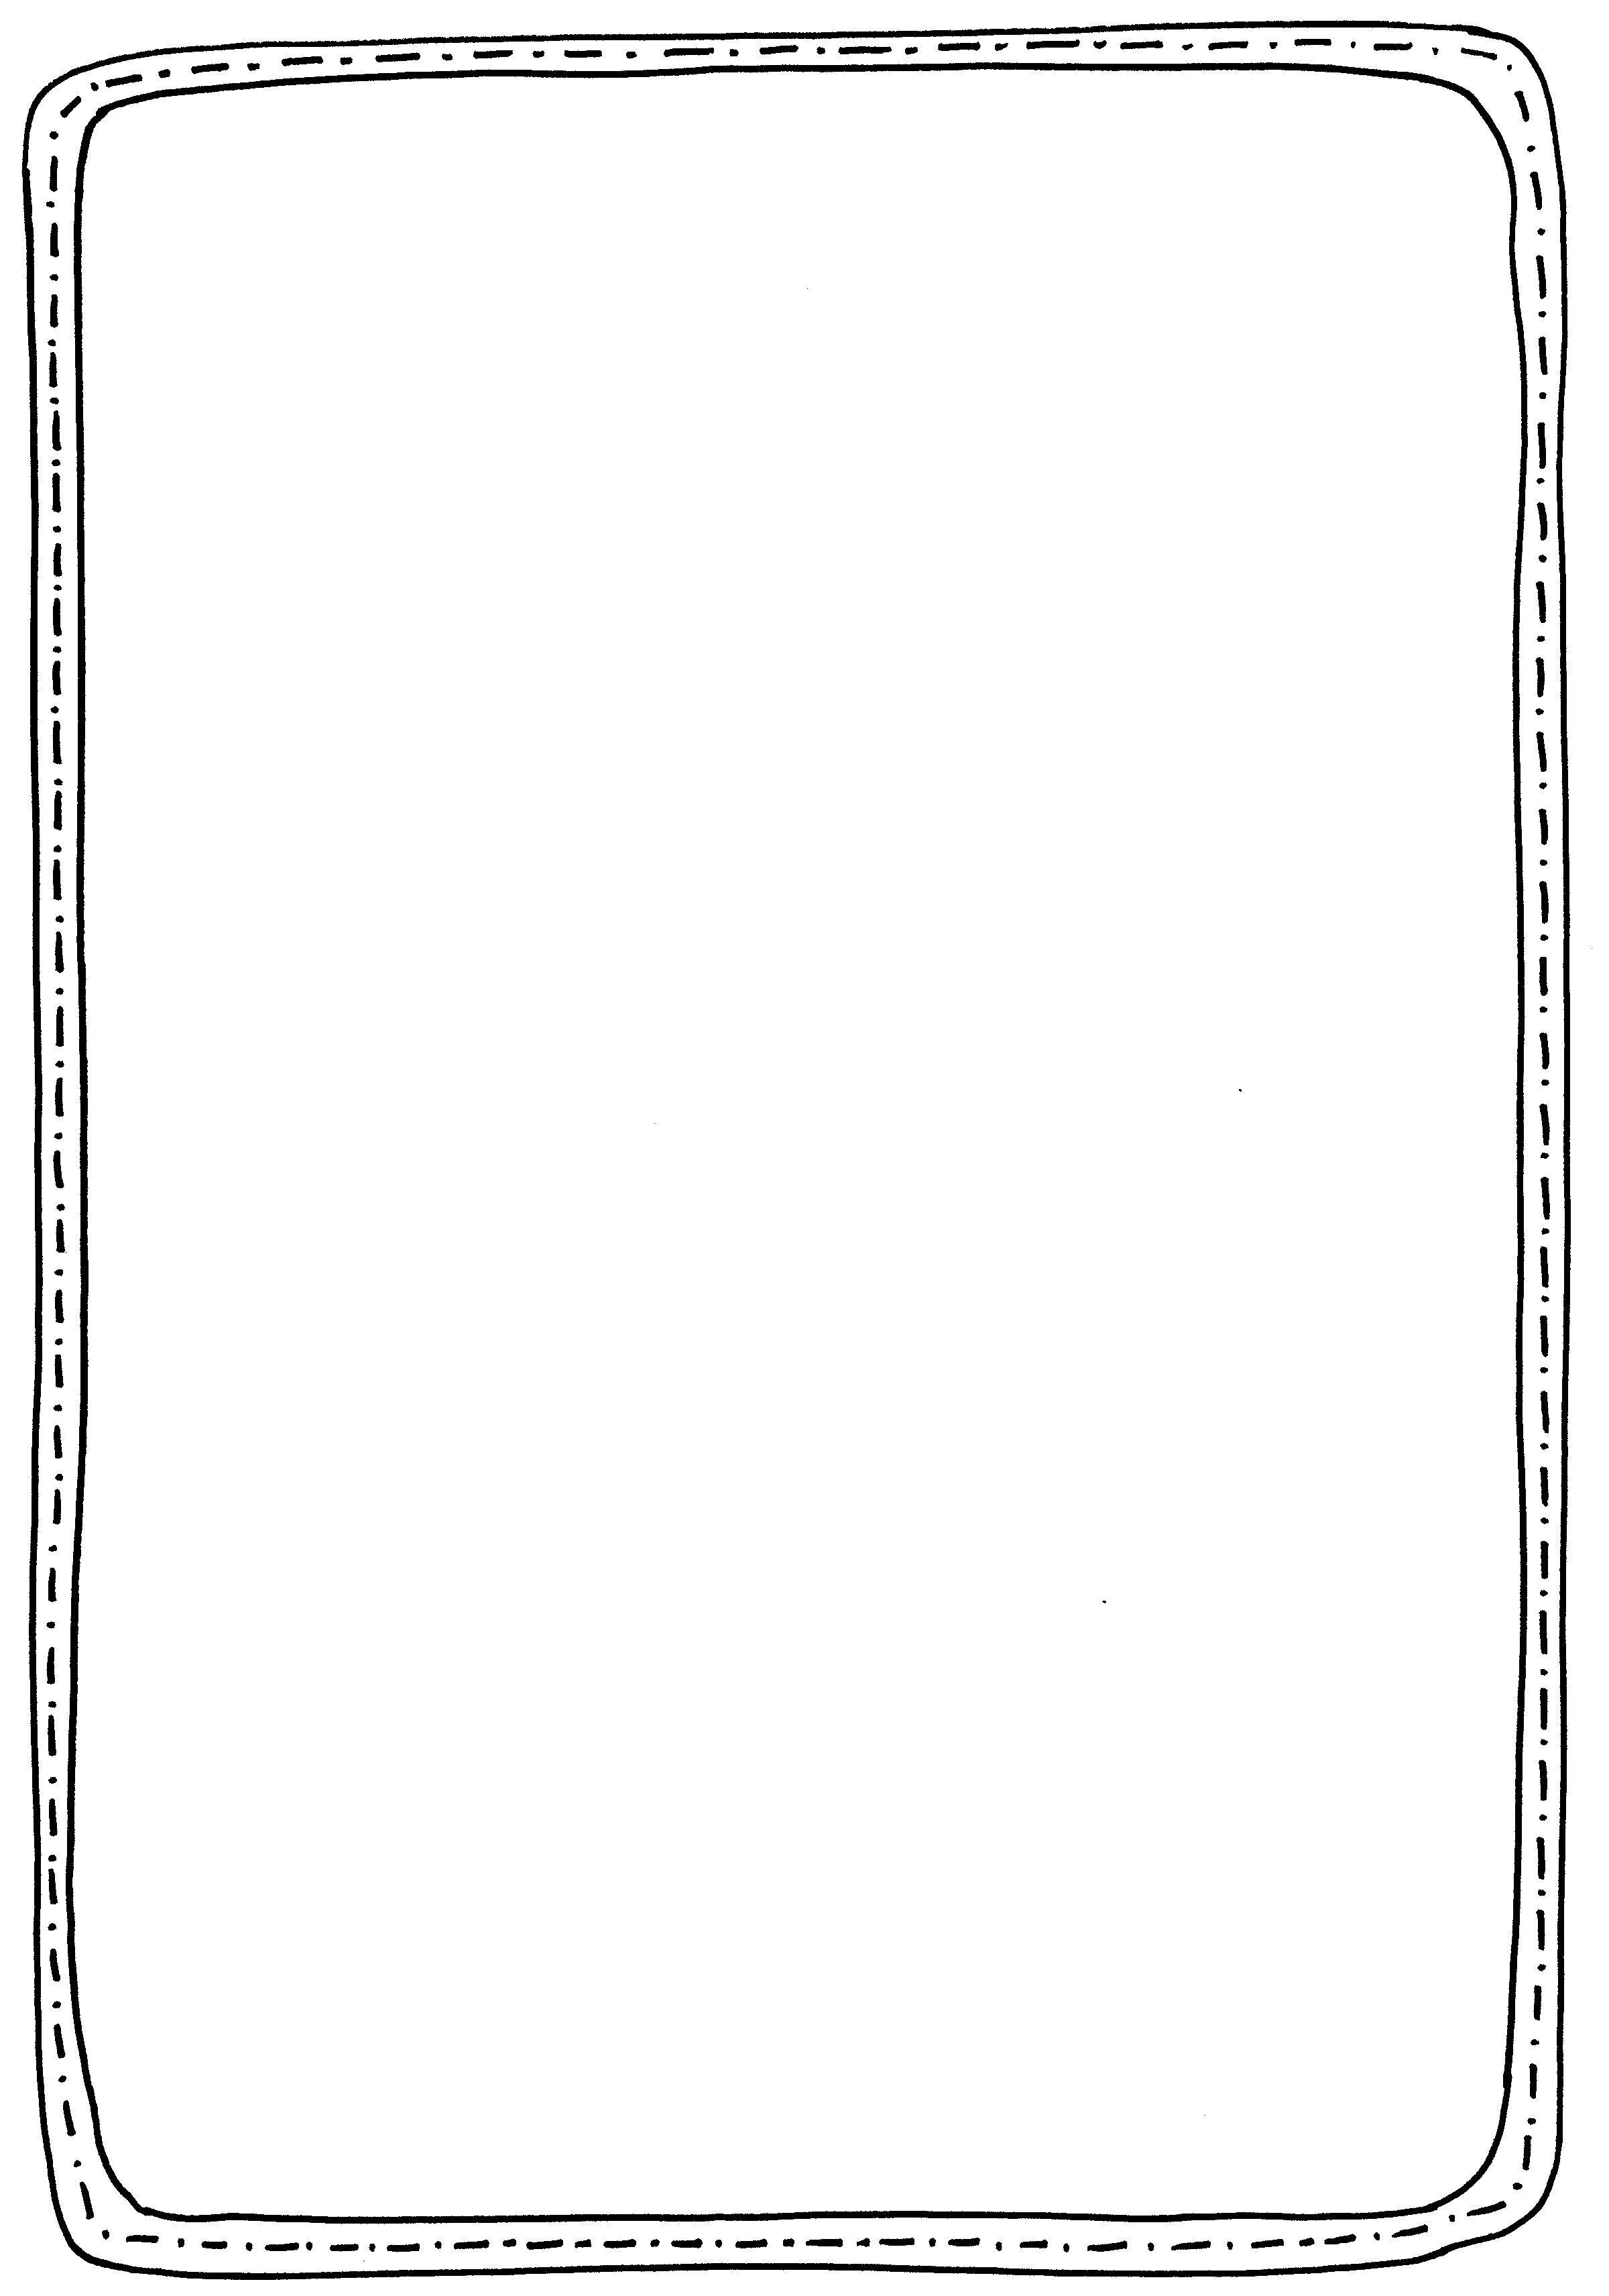 cadres et bordures page borders cover pinterest bordure cadres et affichage. Black Bedroom Furniture Sets. Home Design Ideas